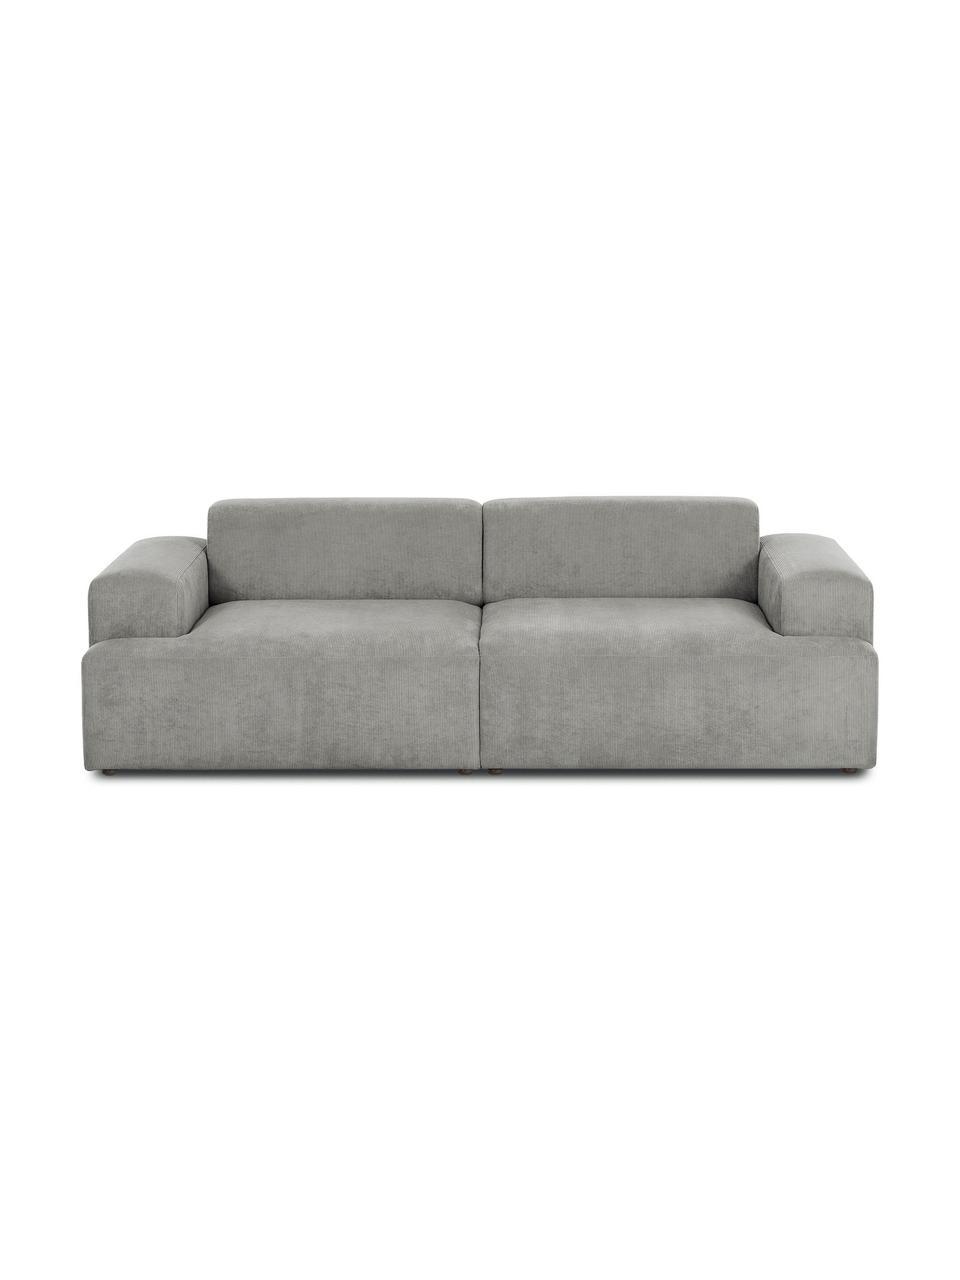 Cord-Sofa Melva (3-Sitzer) in Grau, Bezug: Cord (92% Polyester, 8% P, Gestell: Massives Kiefernholz, FSC, Füße: Kunststoff, Cord Grau, B 238 x T 101 cm